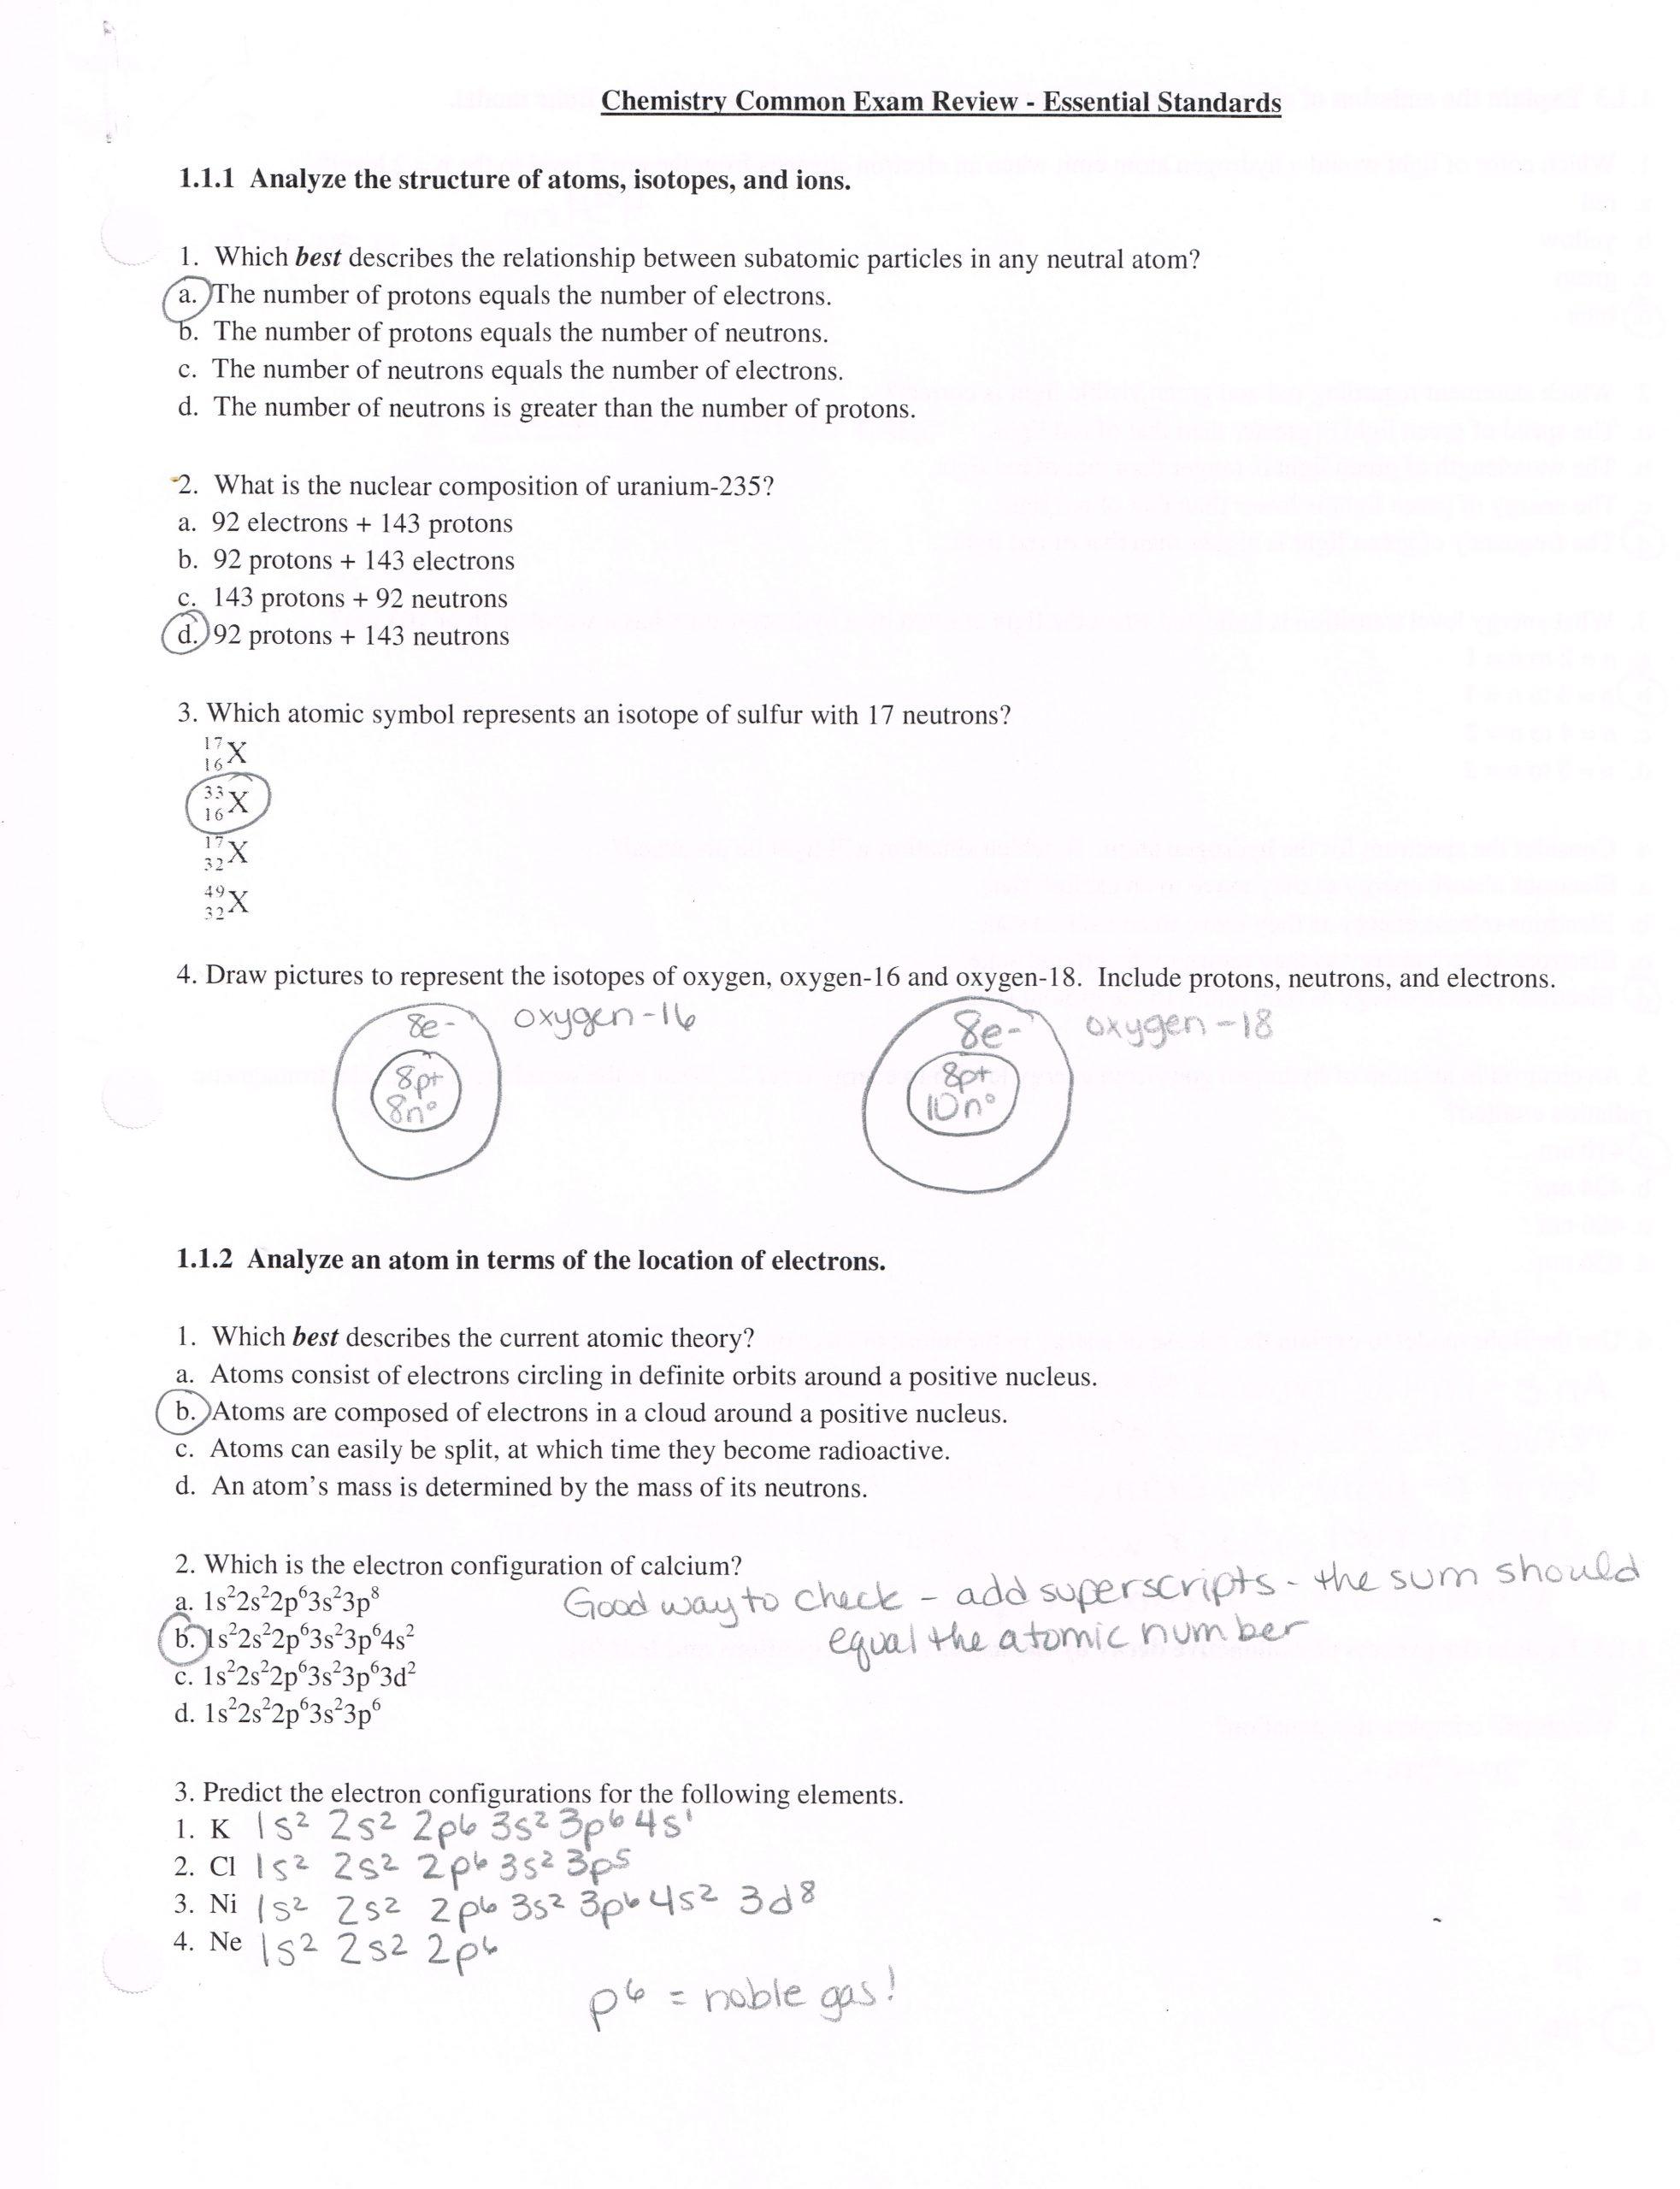 Quantum Numbers Practice Worksheet Electron Configuration Worksheet for High School